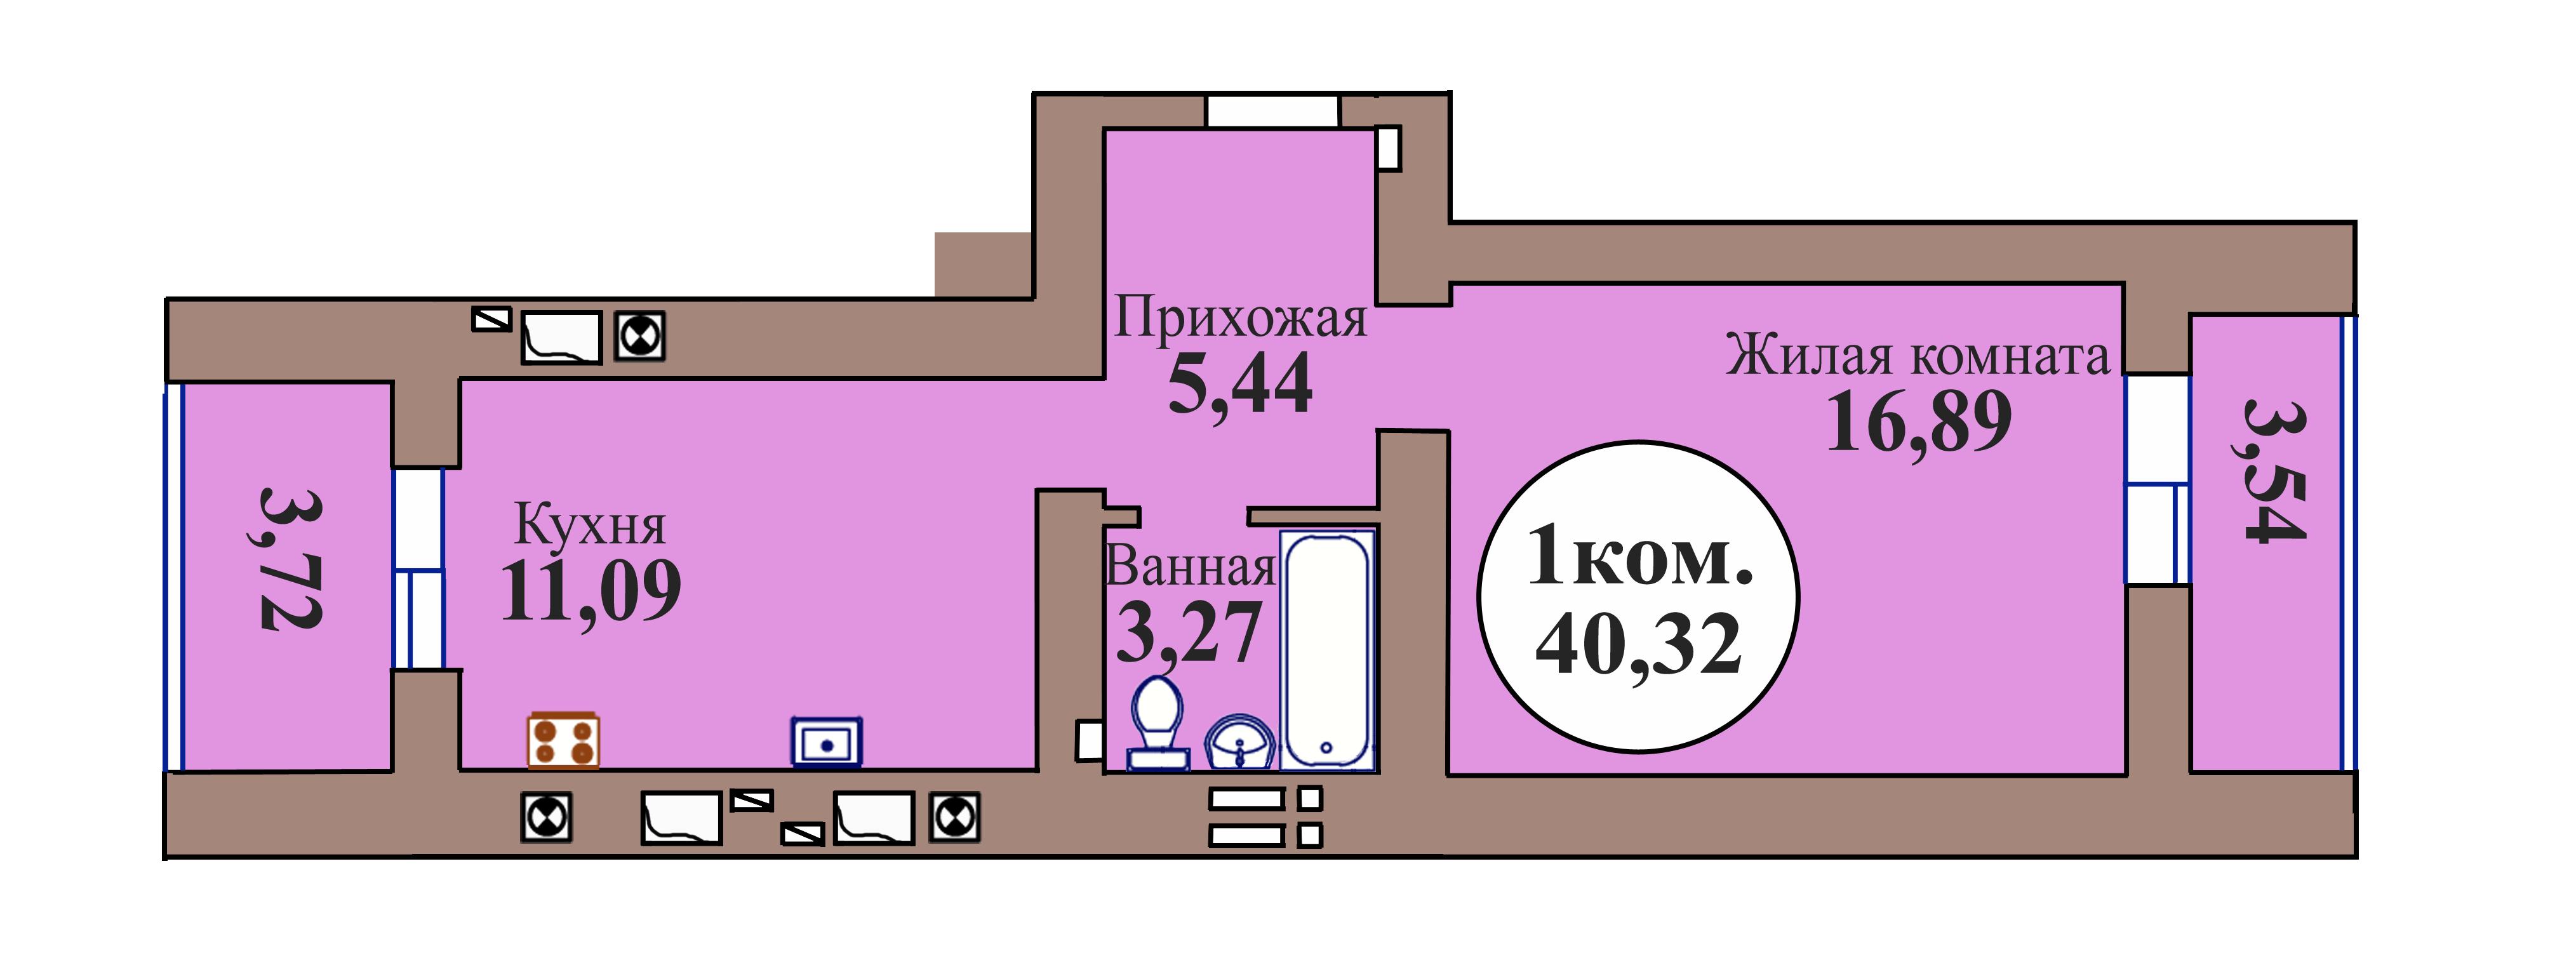 1-комн. кв. по пер. Калининградский, 5 кв. 50 в Калининграде